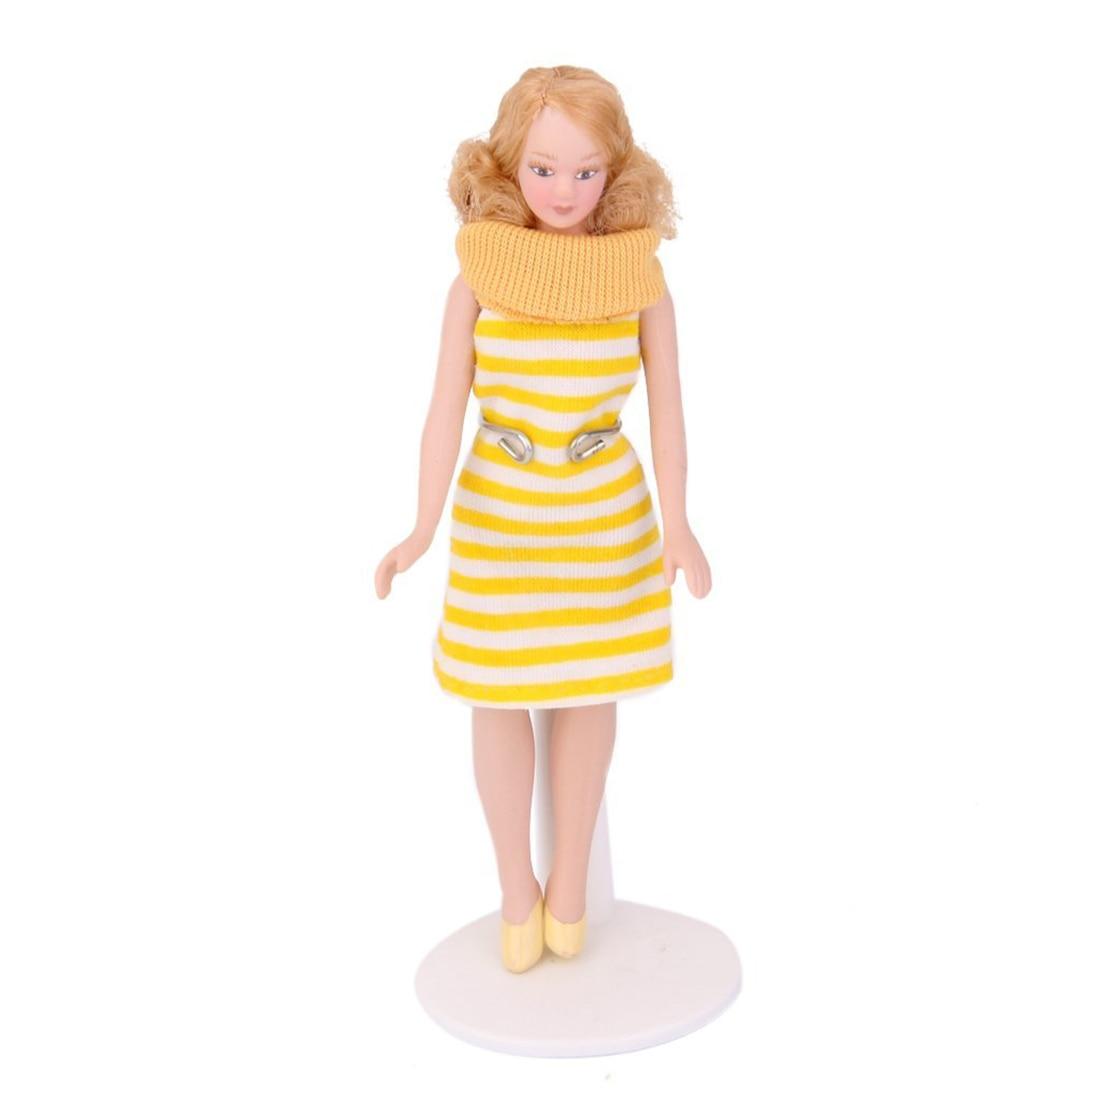 HOT SALE Dollhouse Miniature Porcelain Doll Lady in Striped Dress